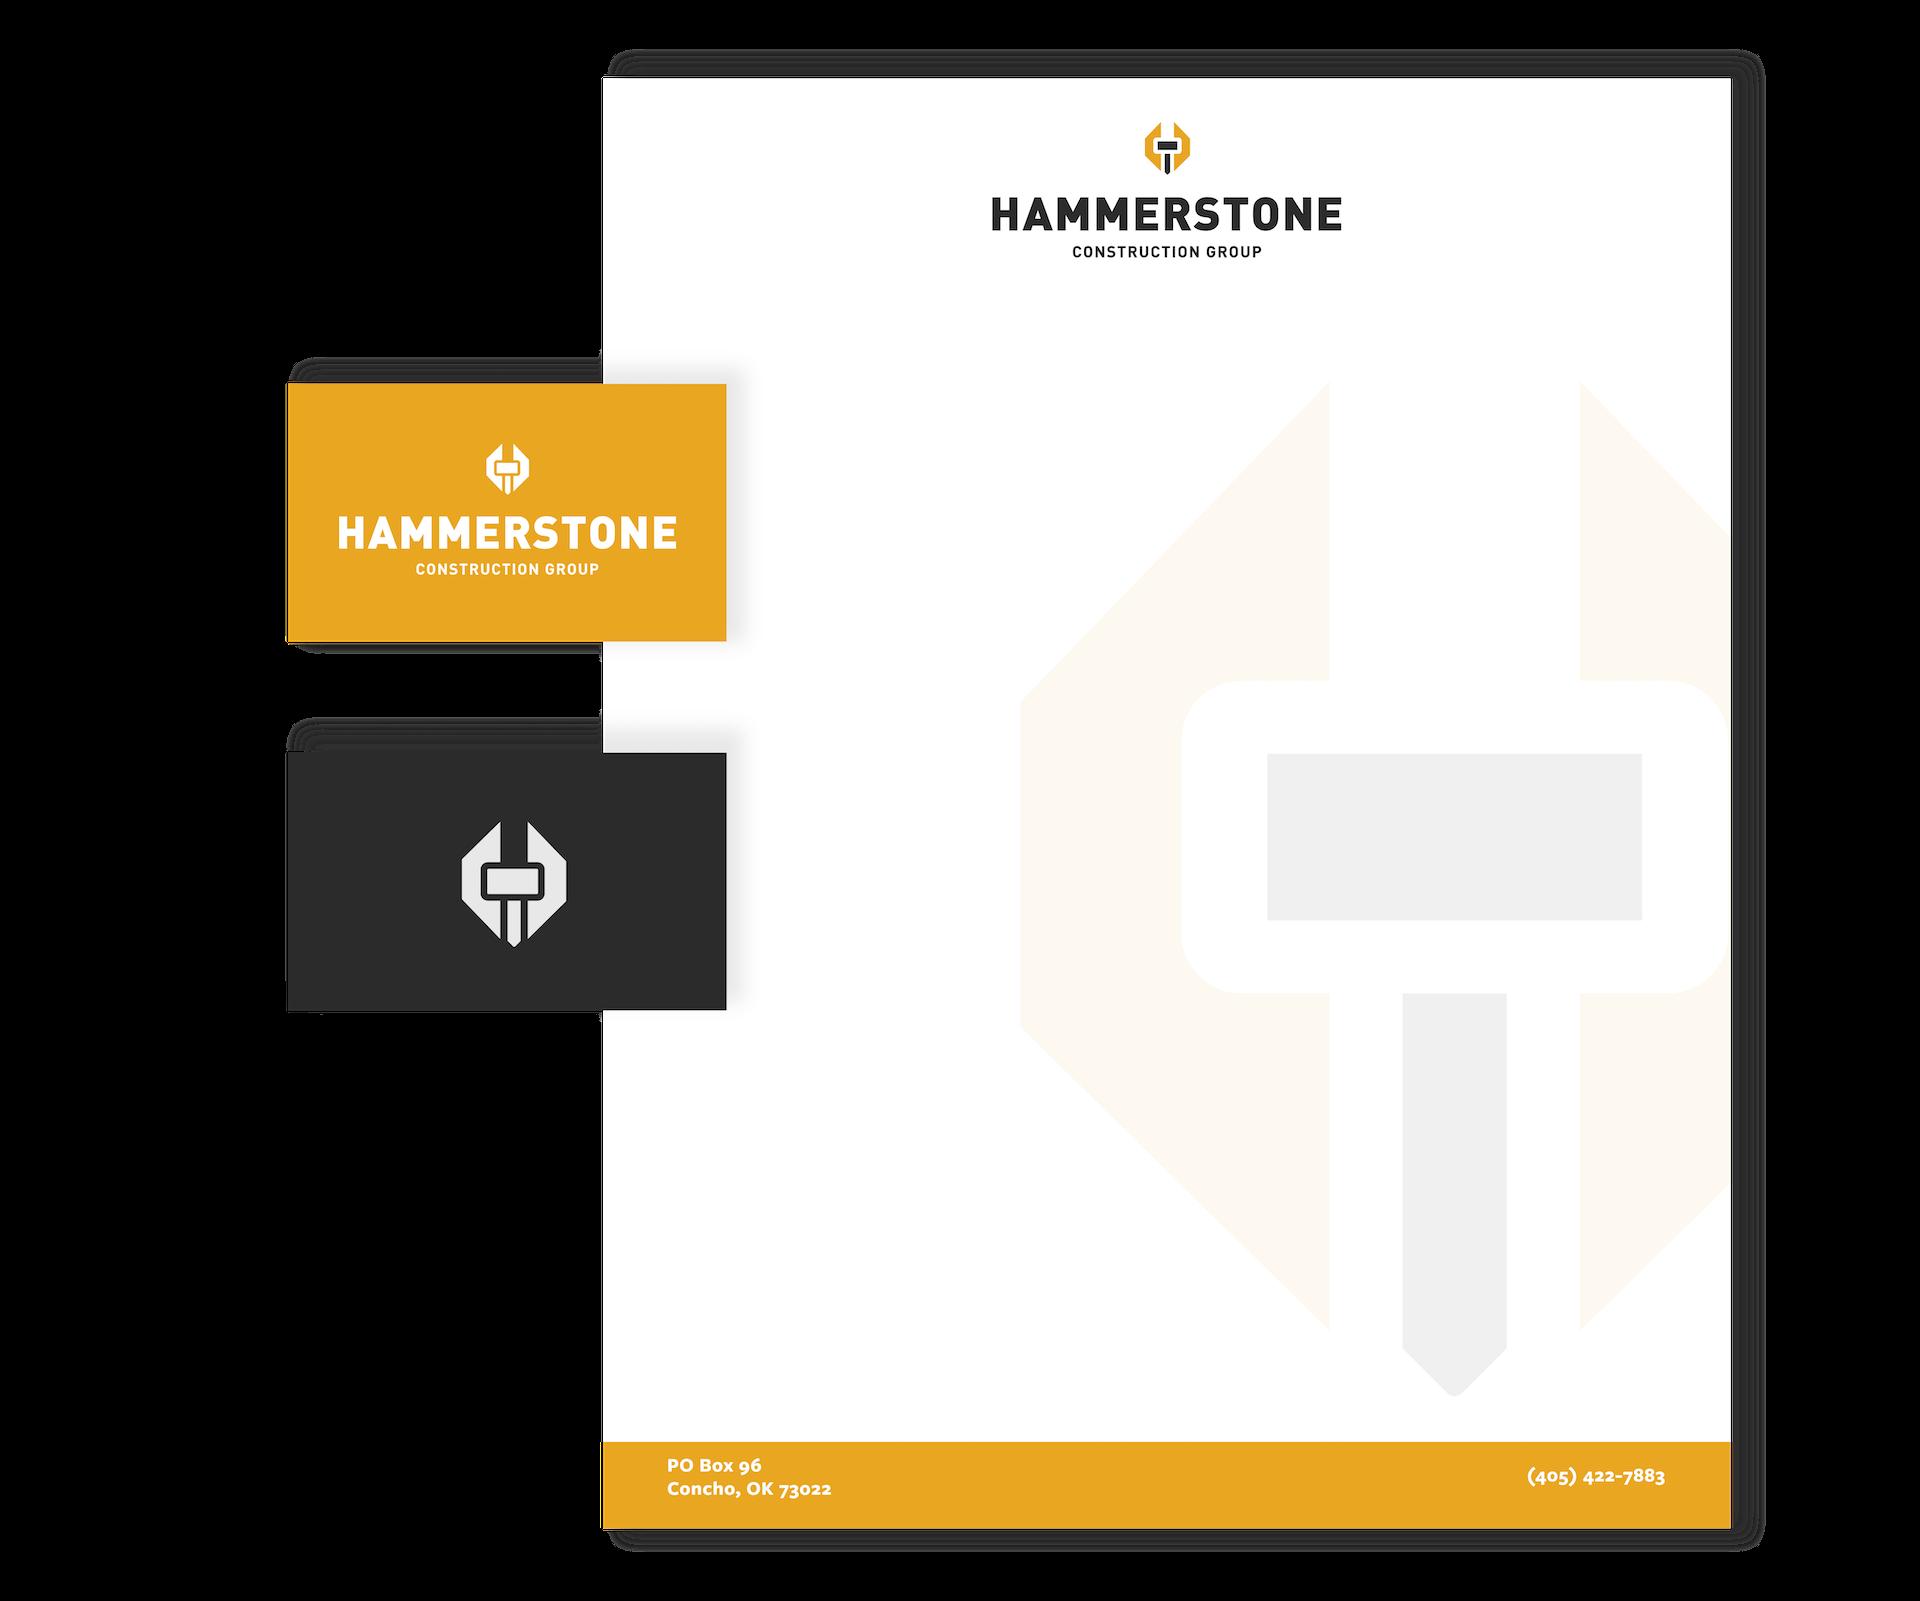 hammerstone branding materials